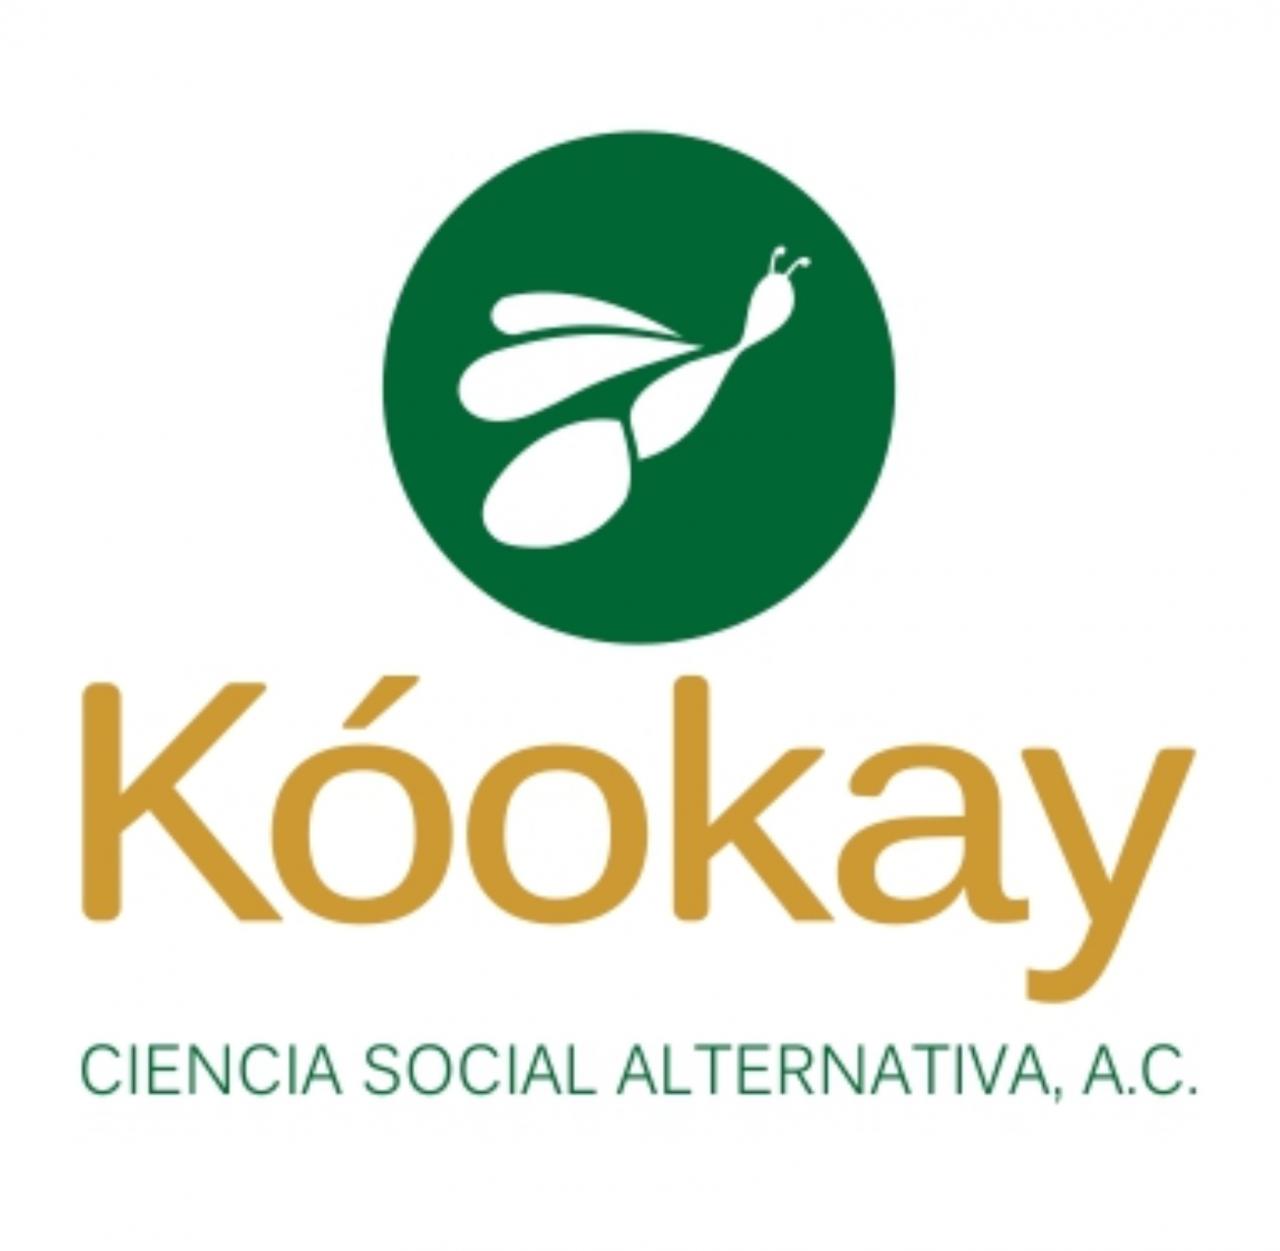 Kookay